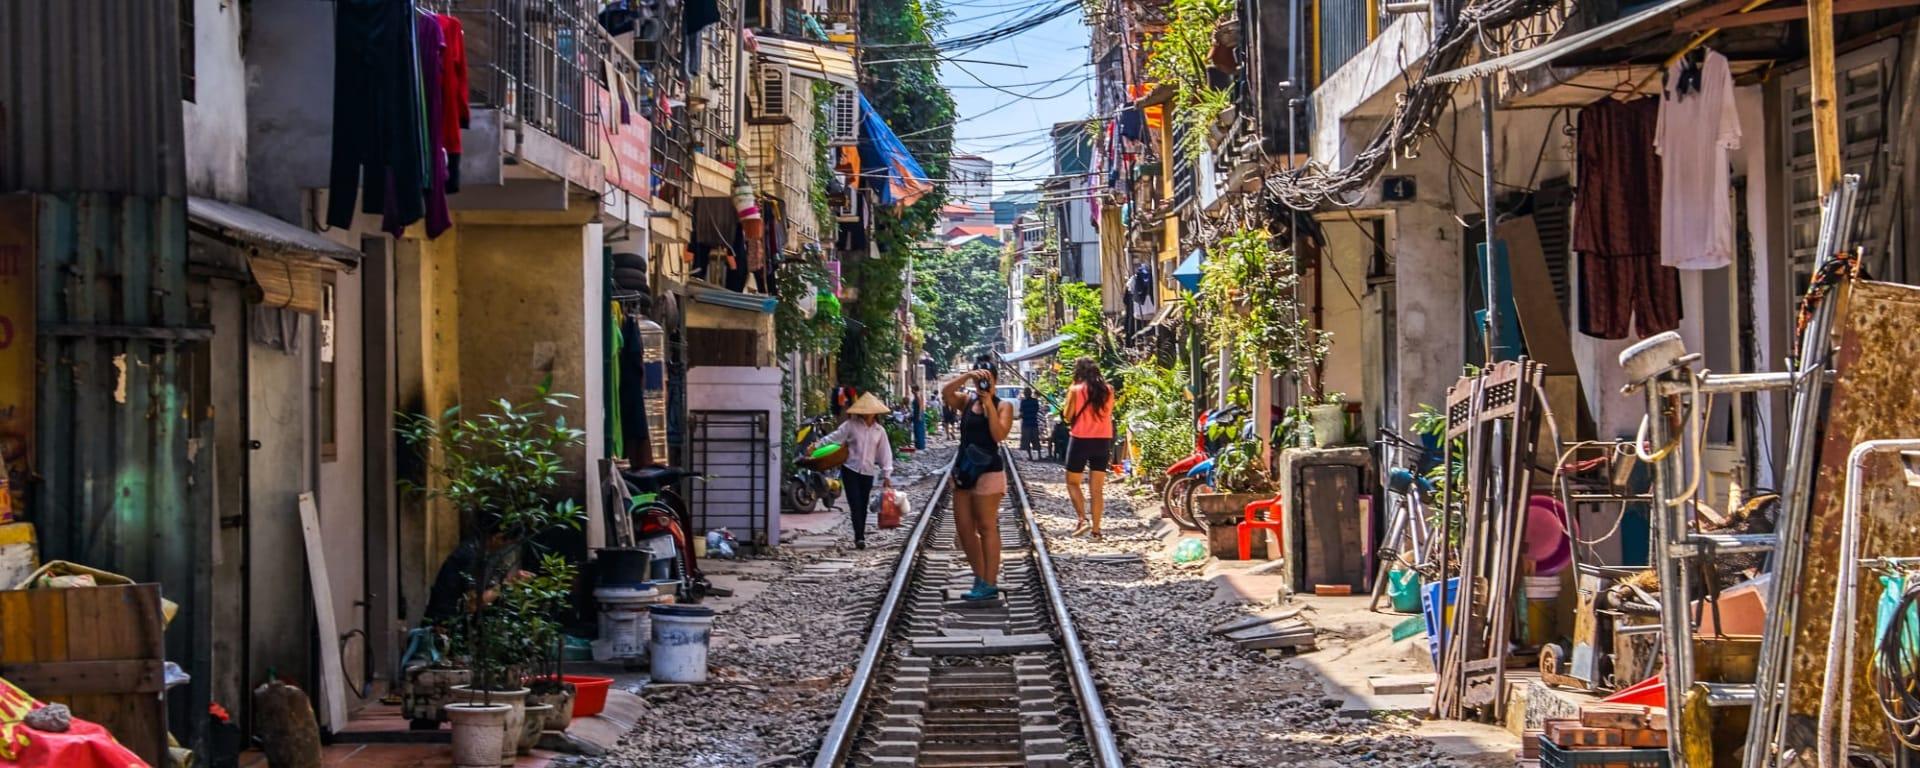 Vietnam Individuell mit dem Zug ab Hanoi: Vietnam Hoi An